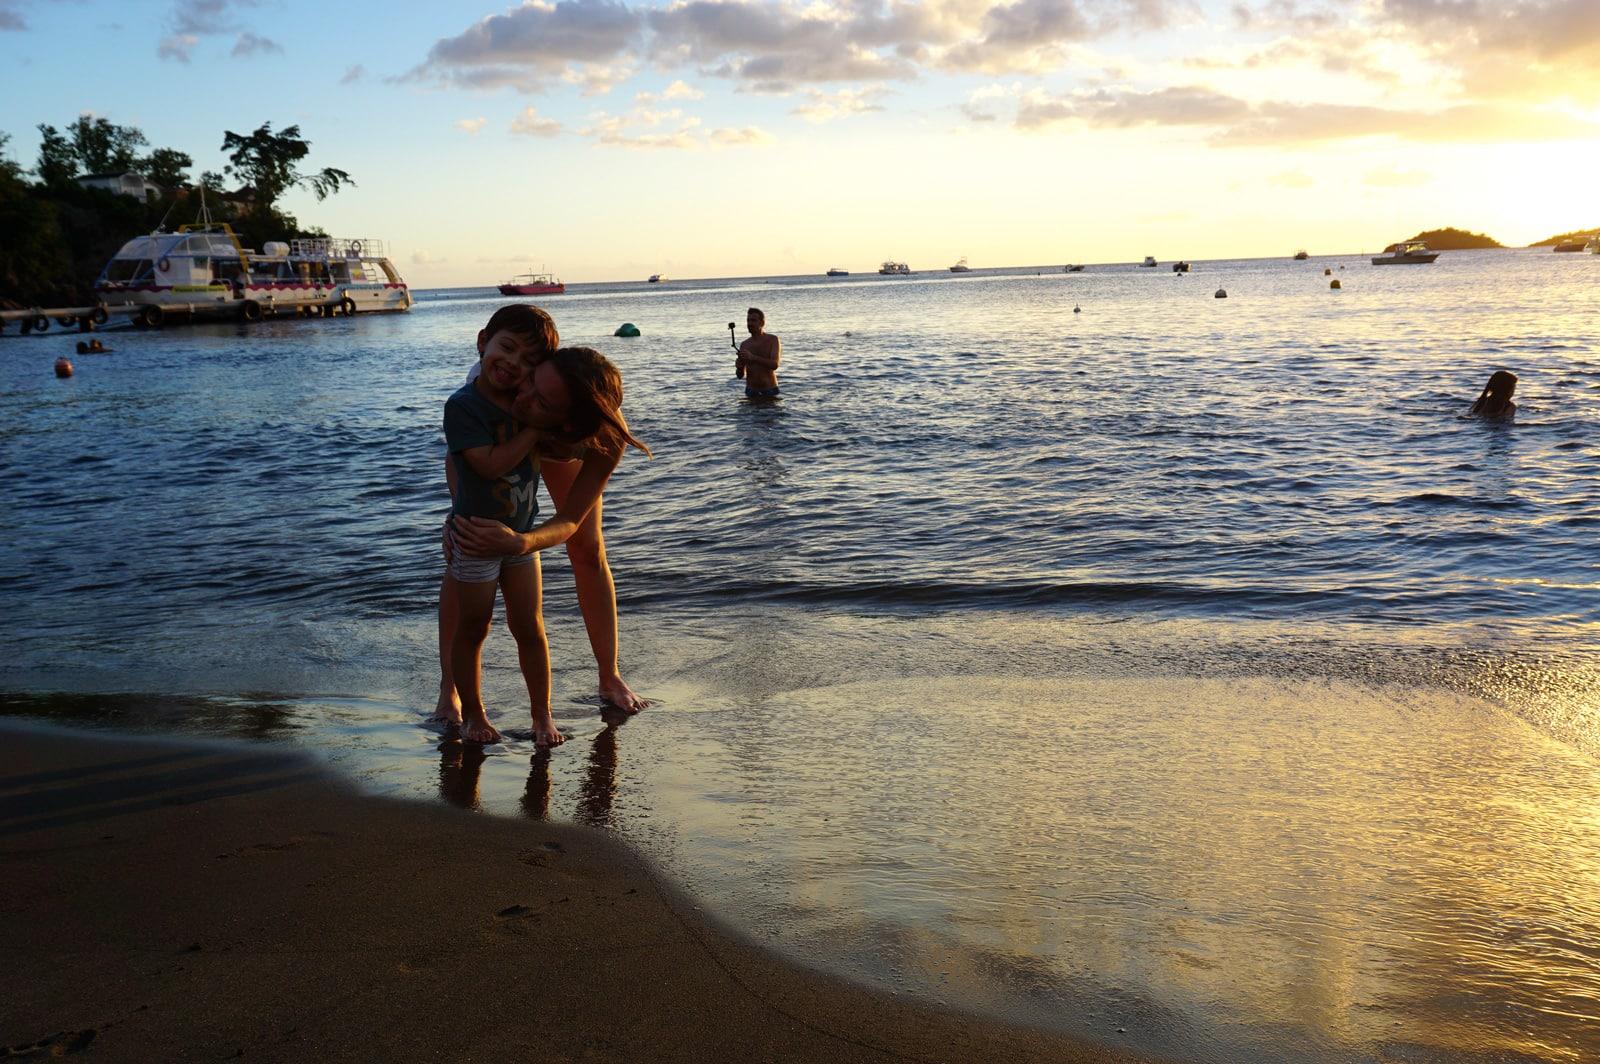 Blog maman voyage : vacances en famille en Guadeloupe